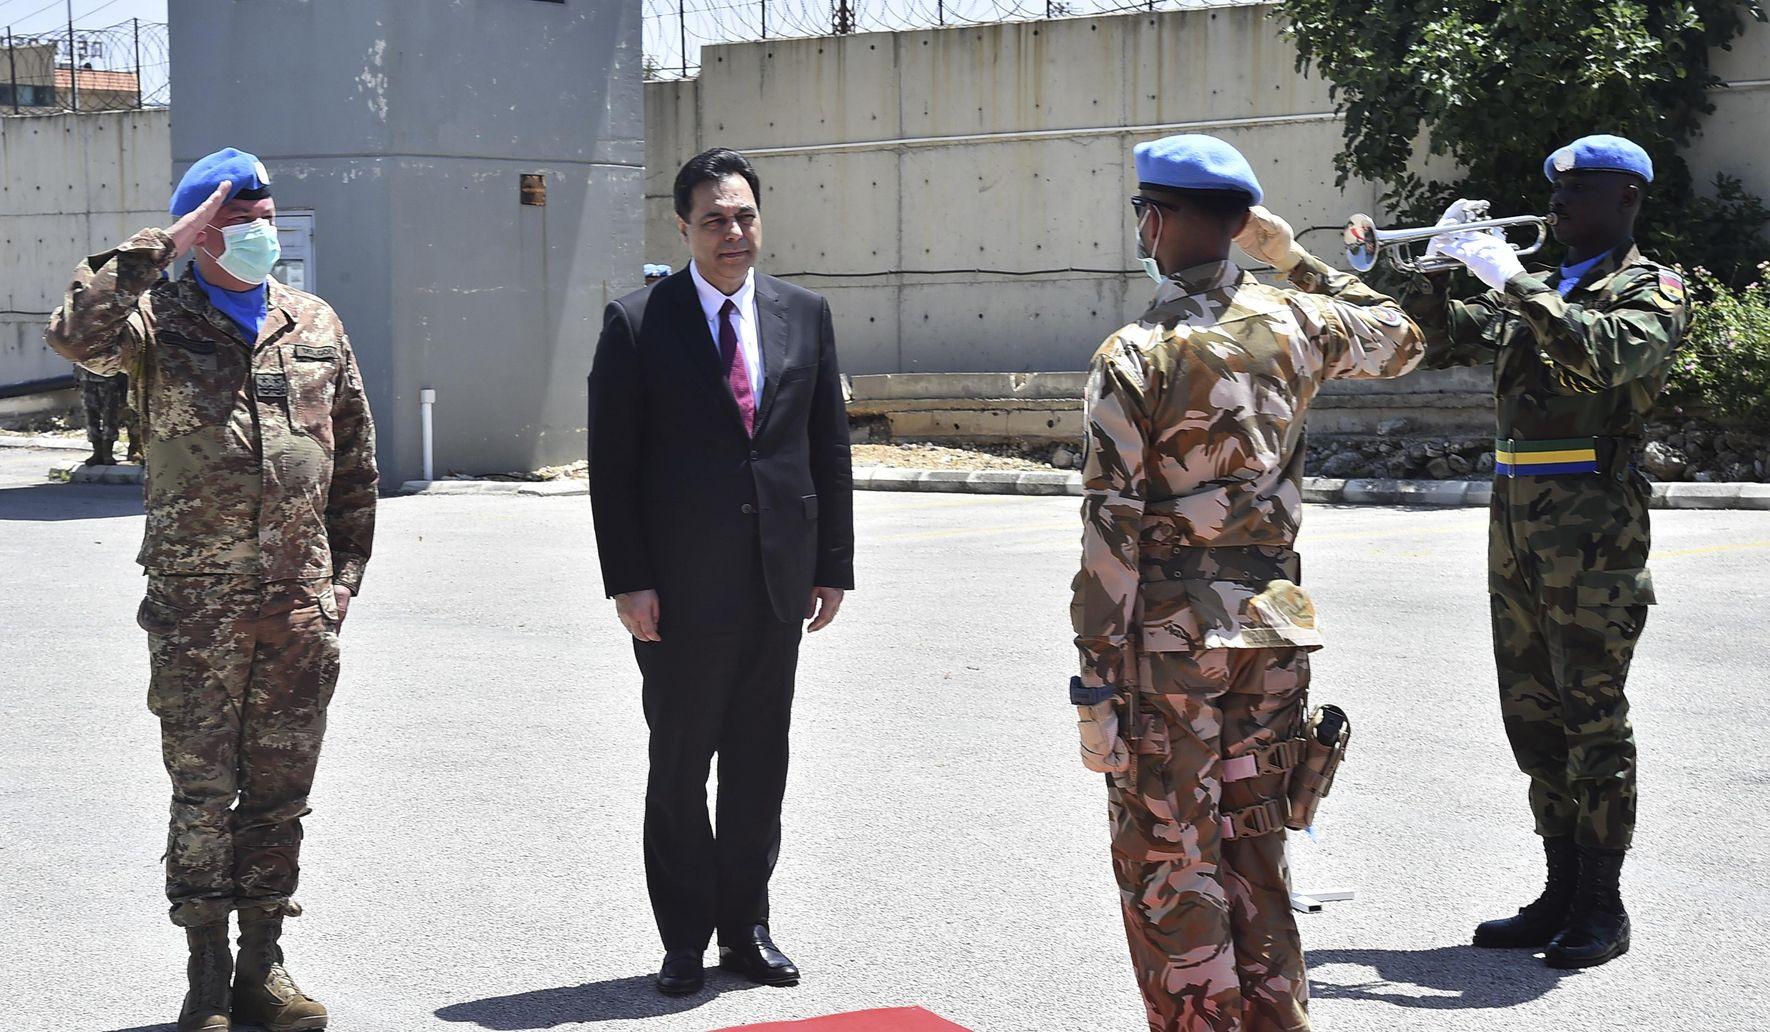 Image of article 'Lebanon extends mandate of UN force along Israel border'